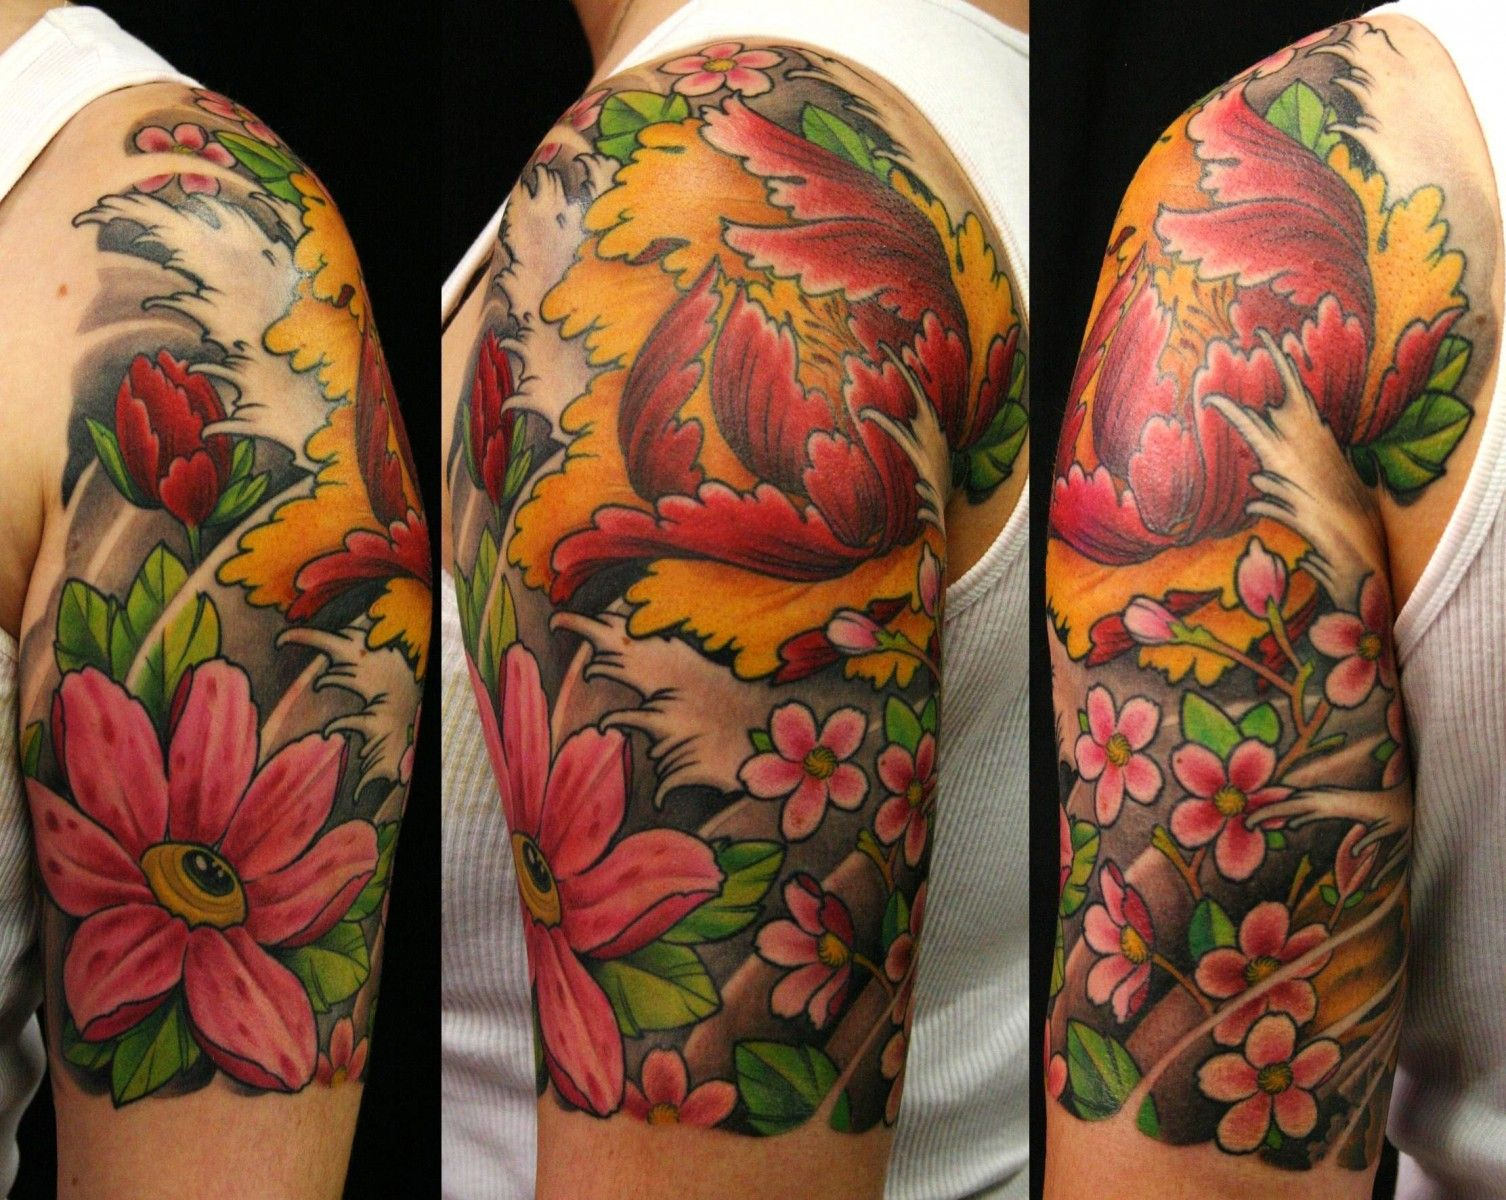 japanese tattoo creatures and flowers | Japanese Flower Tattoos ...